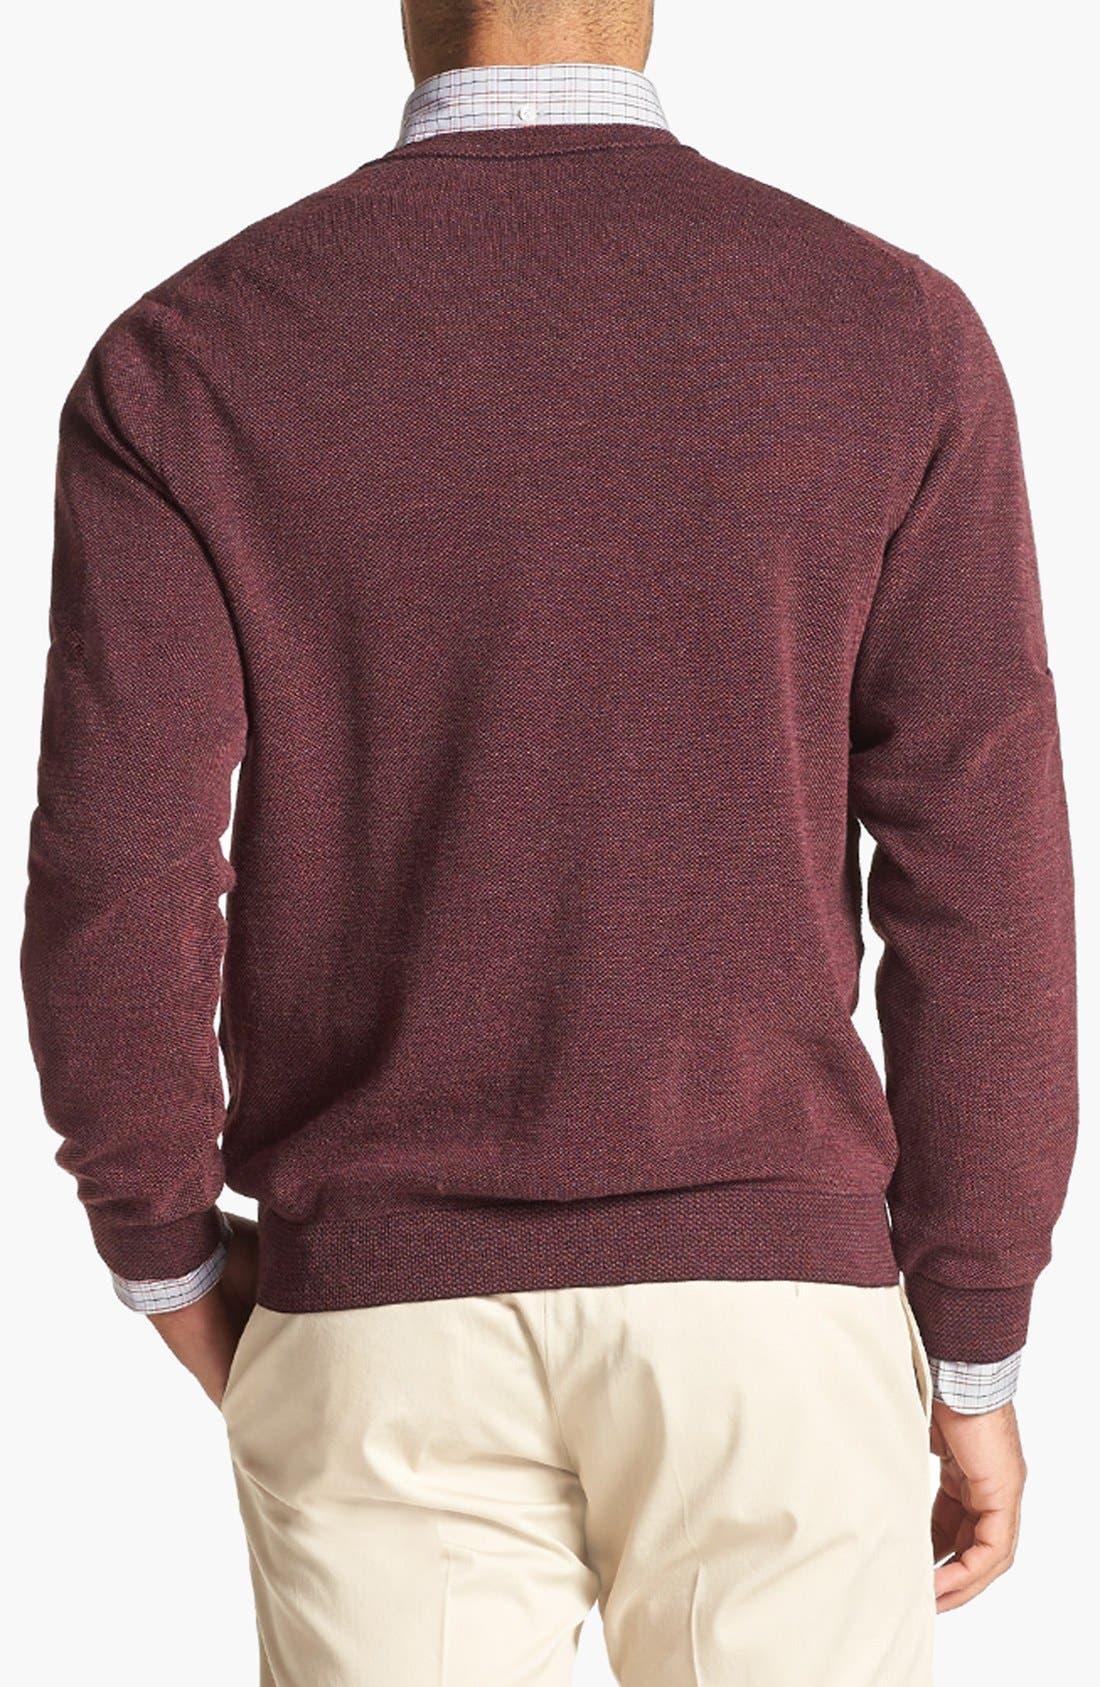 Alternate Image 2  - John W. Nordstrom® Merino Wool Crewneck Sweater